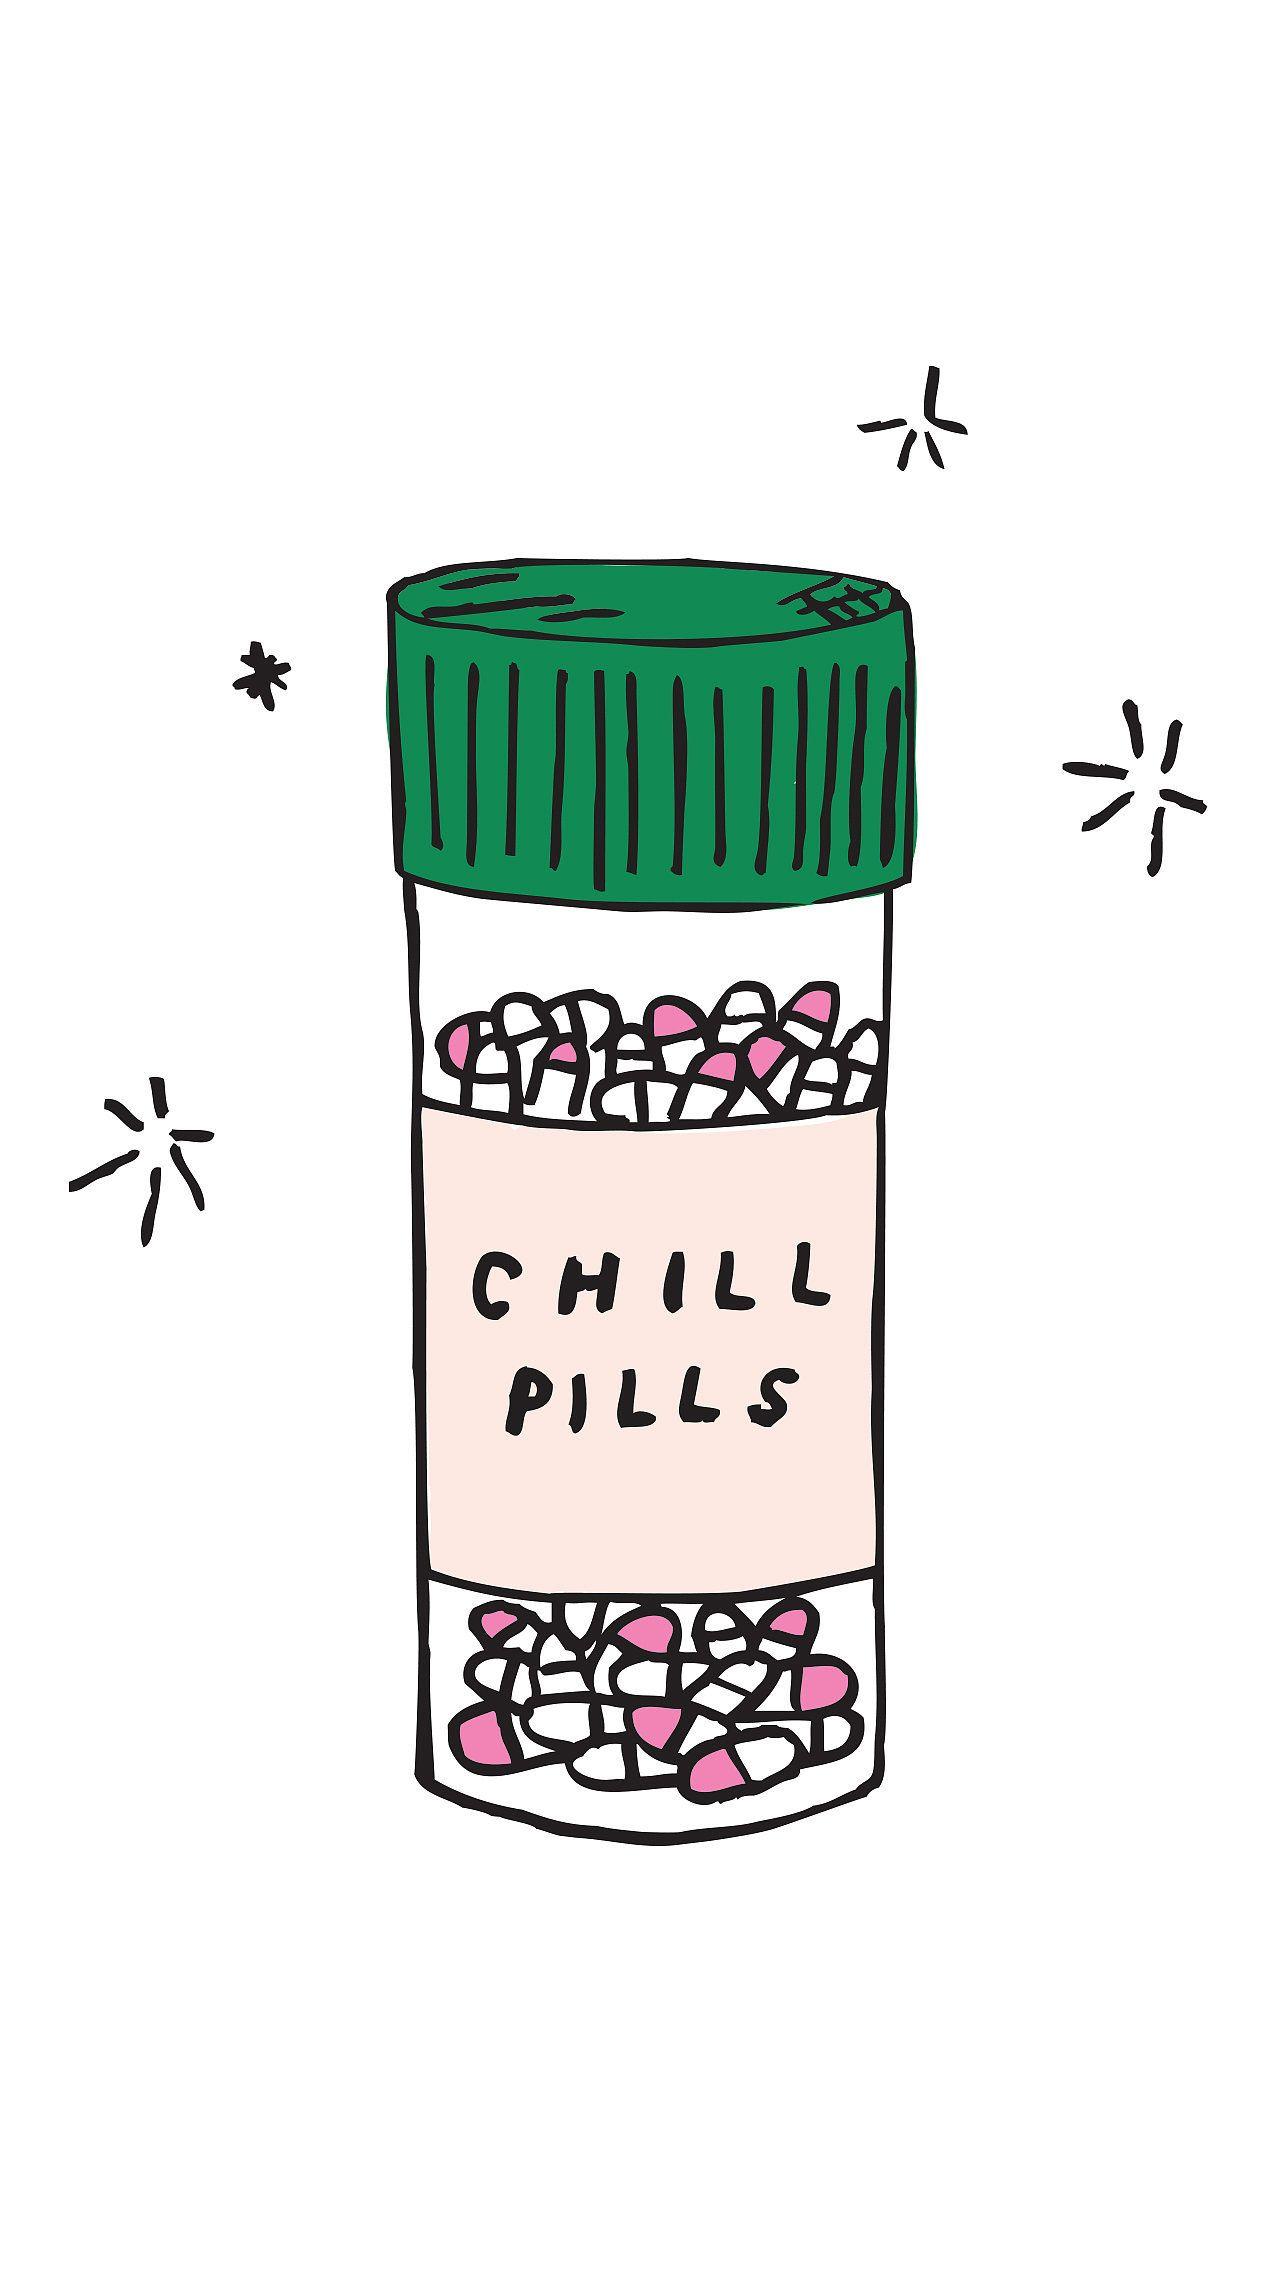 Chill Pills Illustrations Iphone Wallpaper Wallpaper Iphone 6